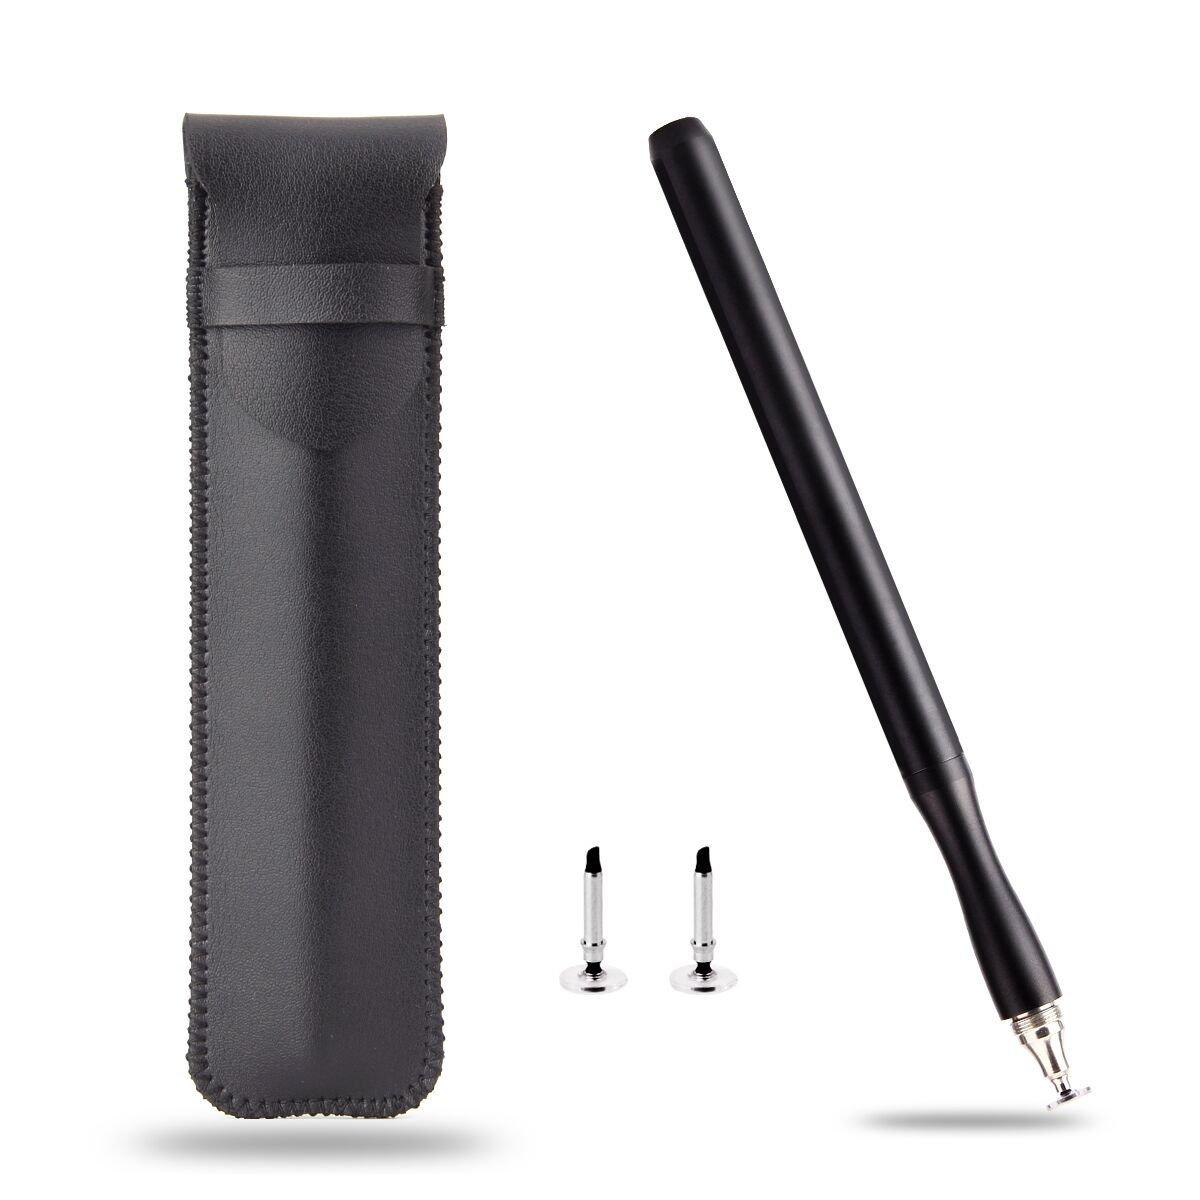 ASONRL Stylus pen